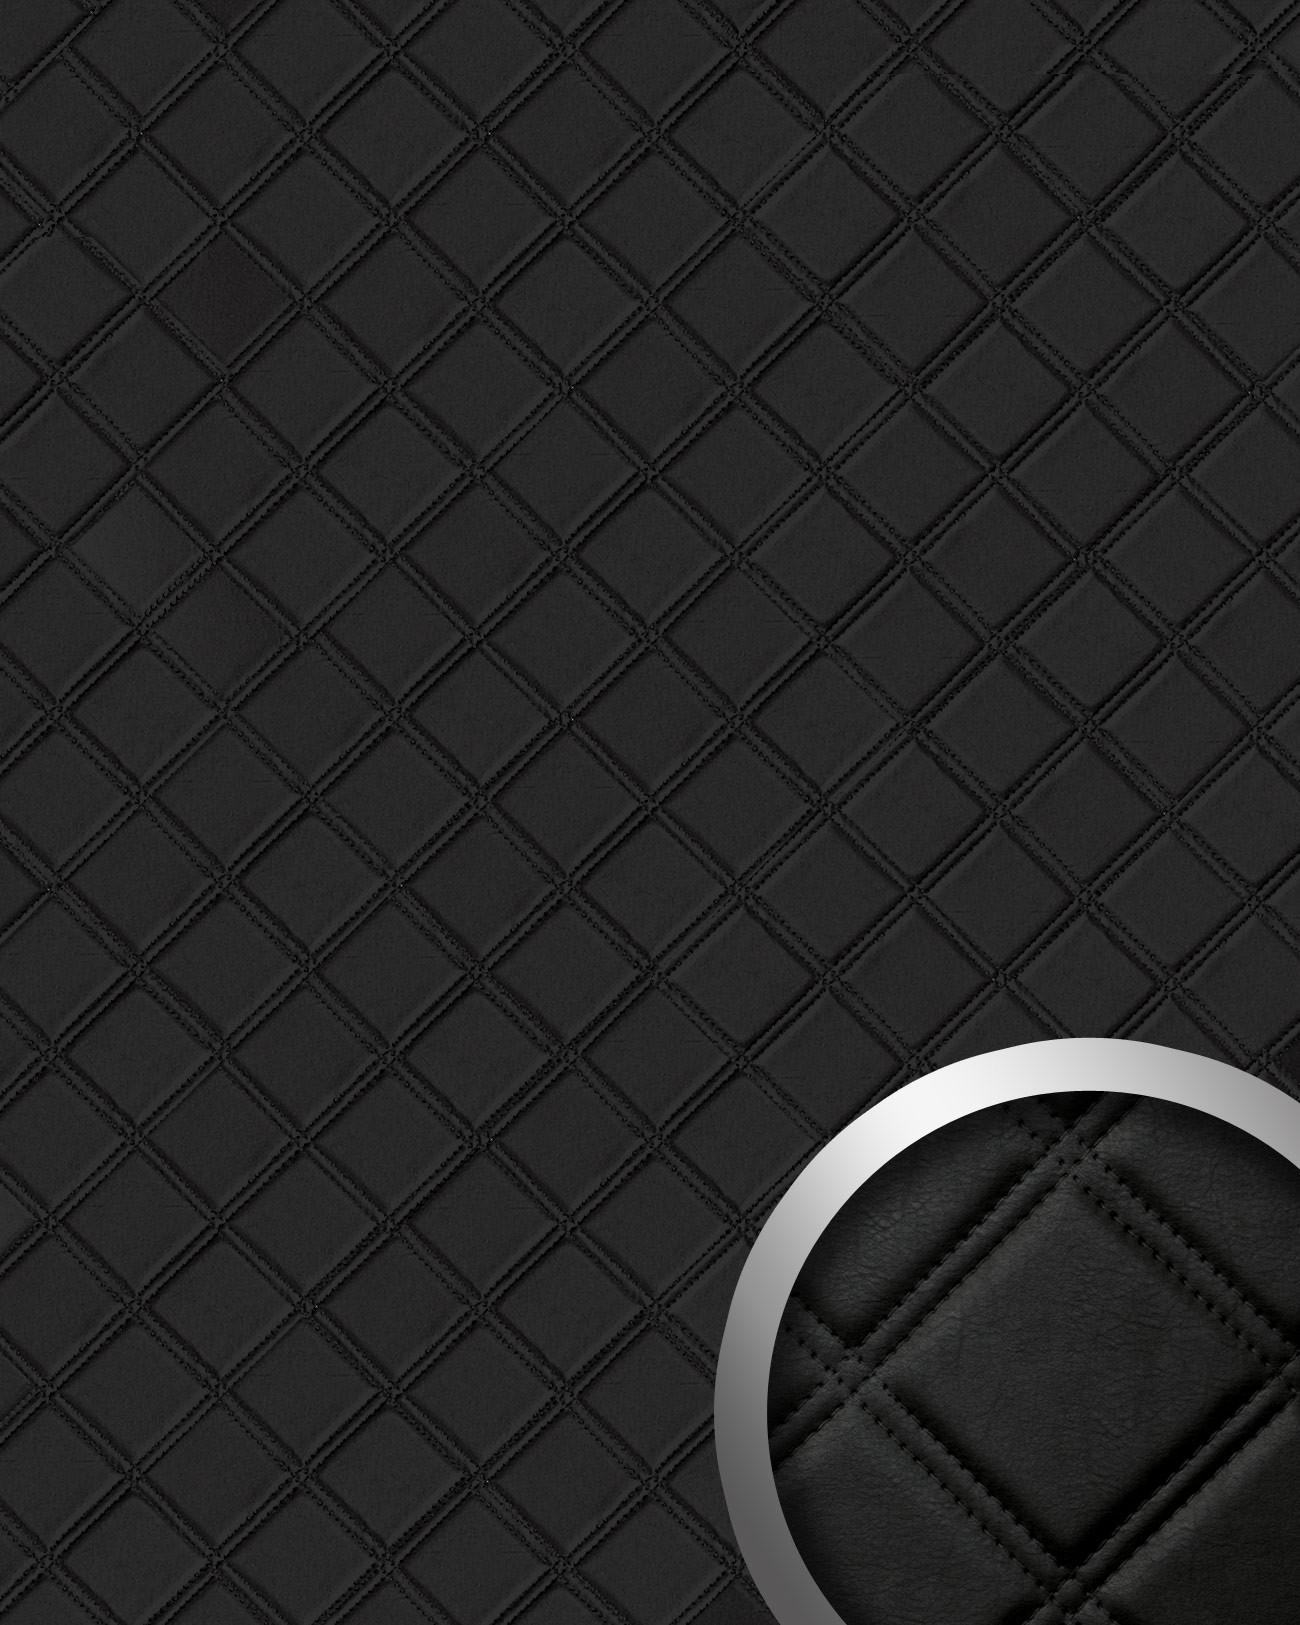 wandpaneel karo leder luxus 3d wallface 15030 rombo blickfang dekor selbstklebende tapete. Black Bedroom Furniture Sets. Home Design Ideas